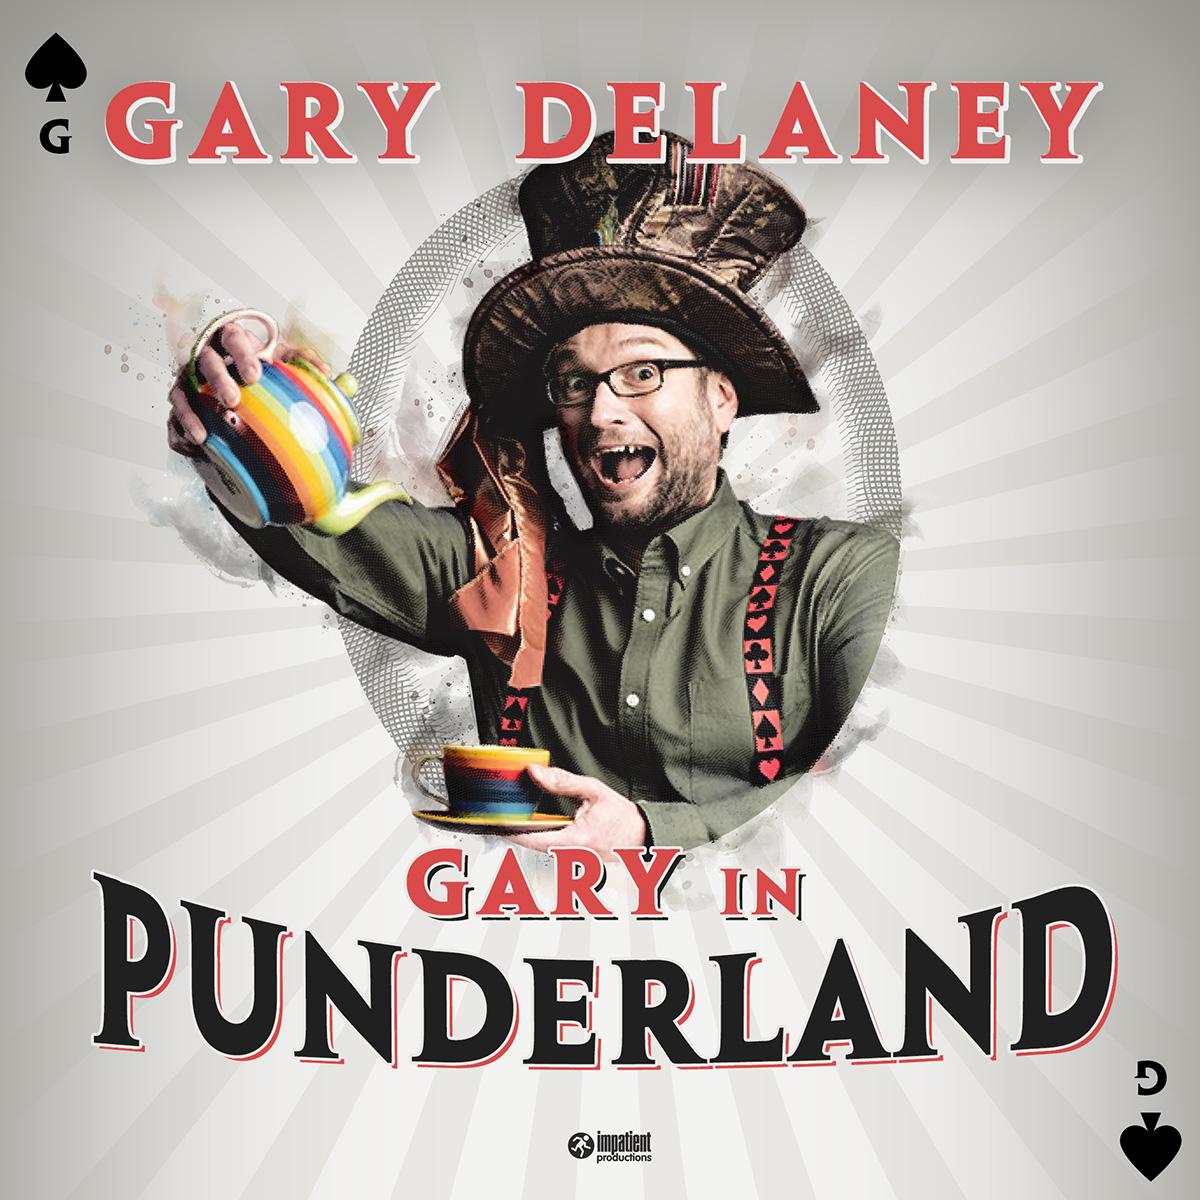 gary delaney in punderland